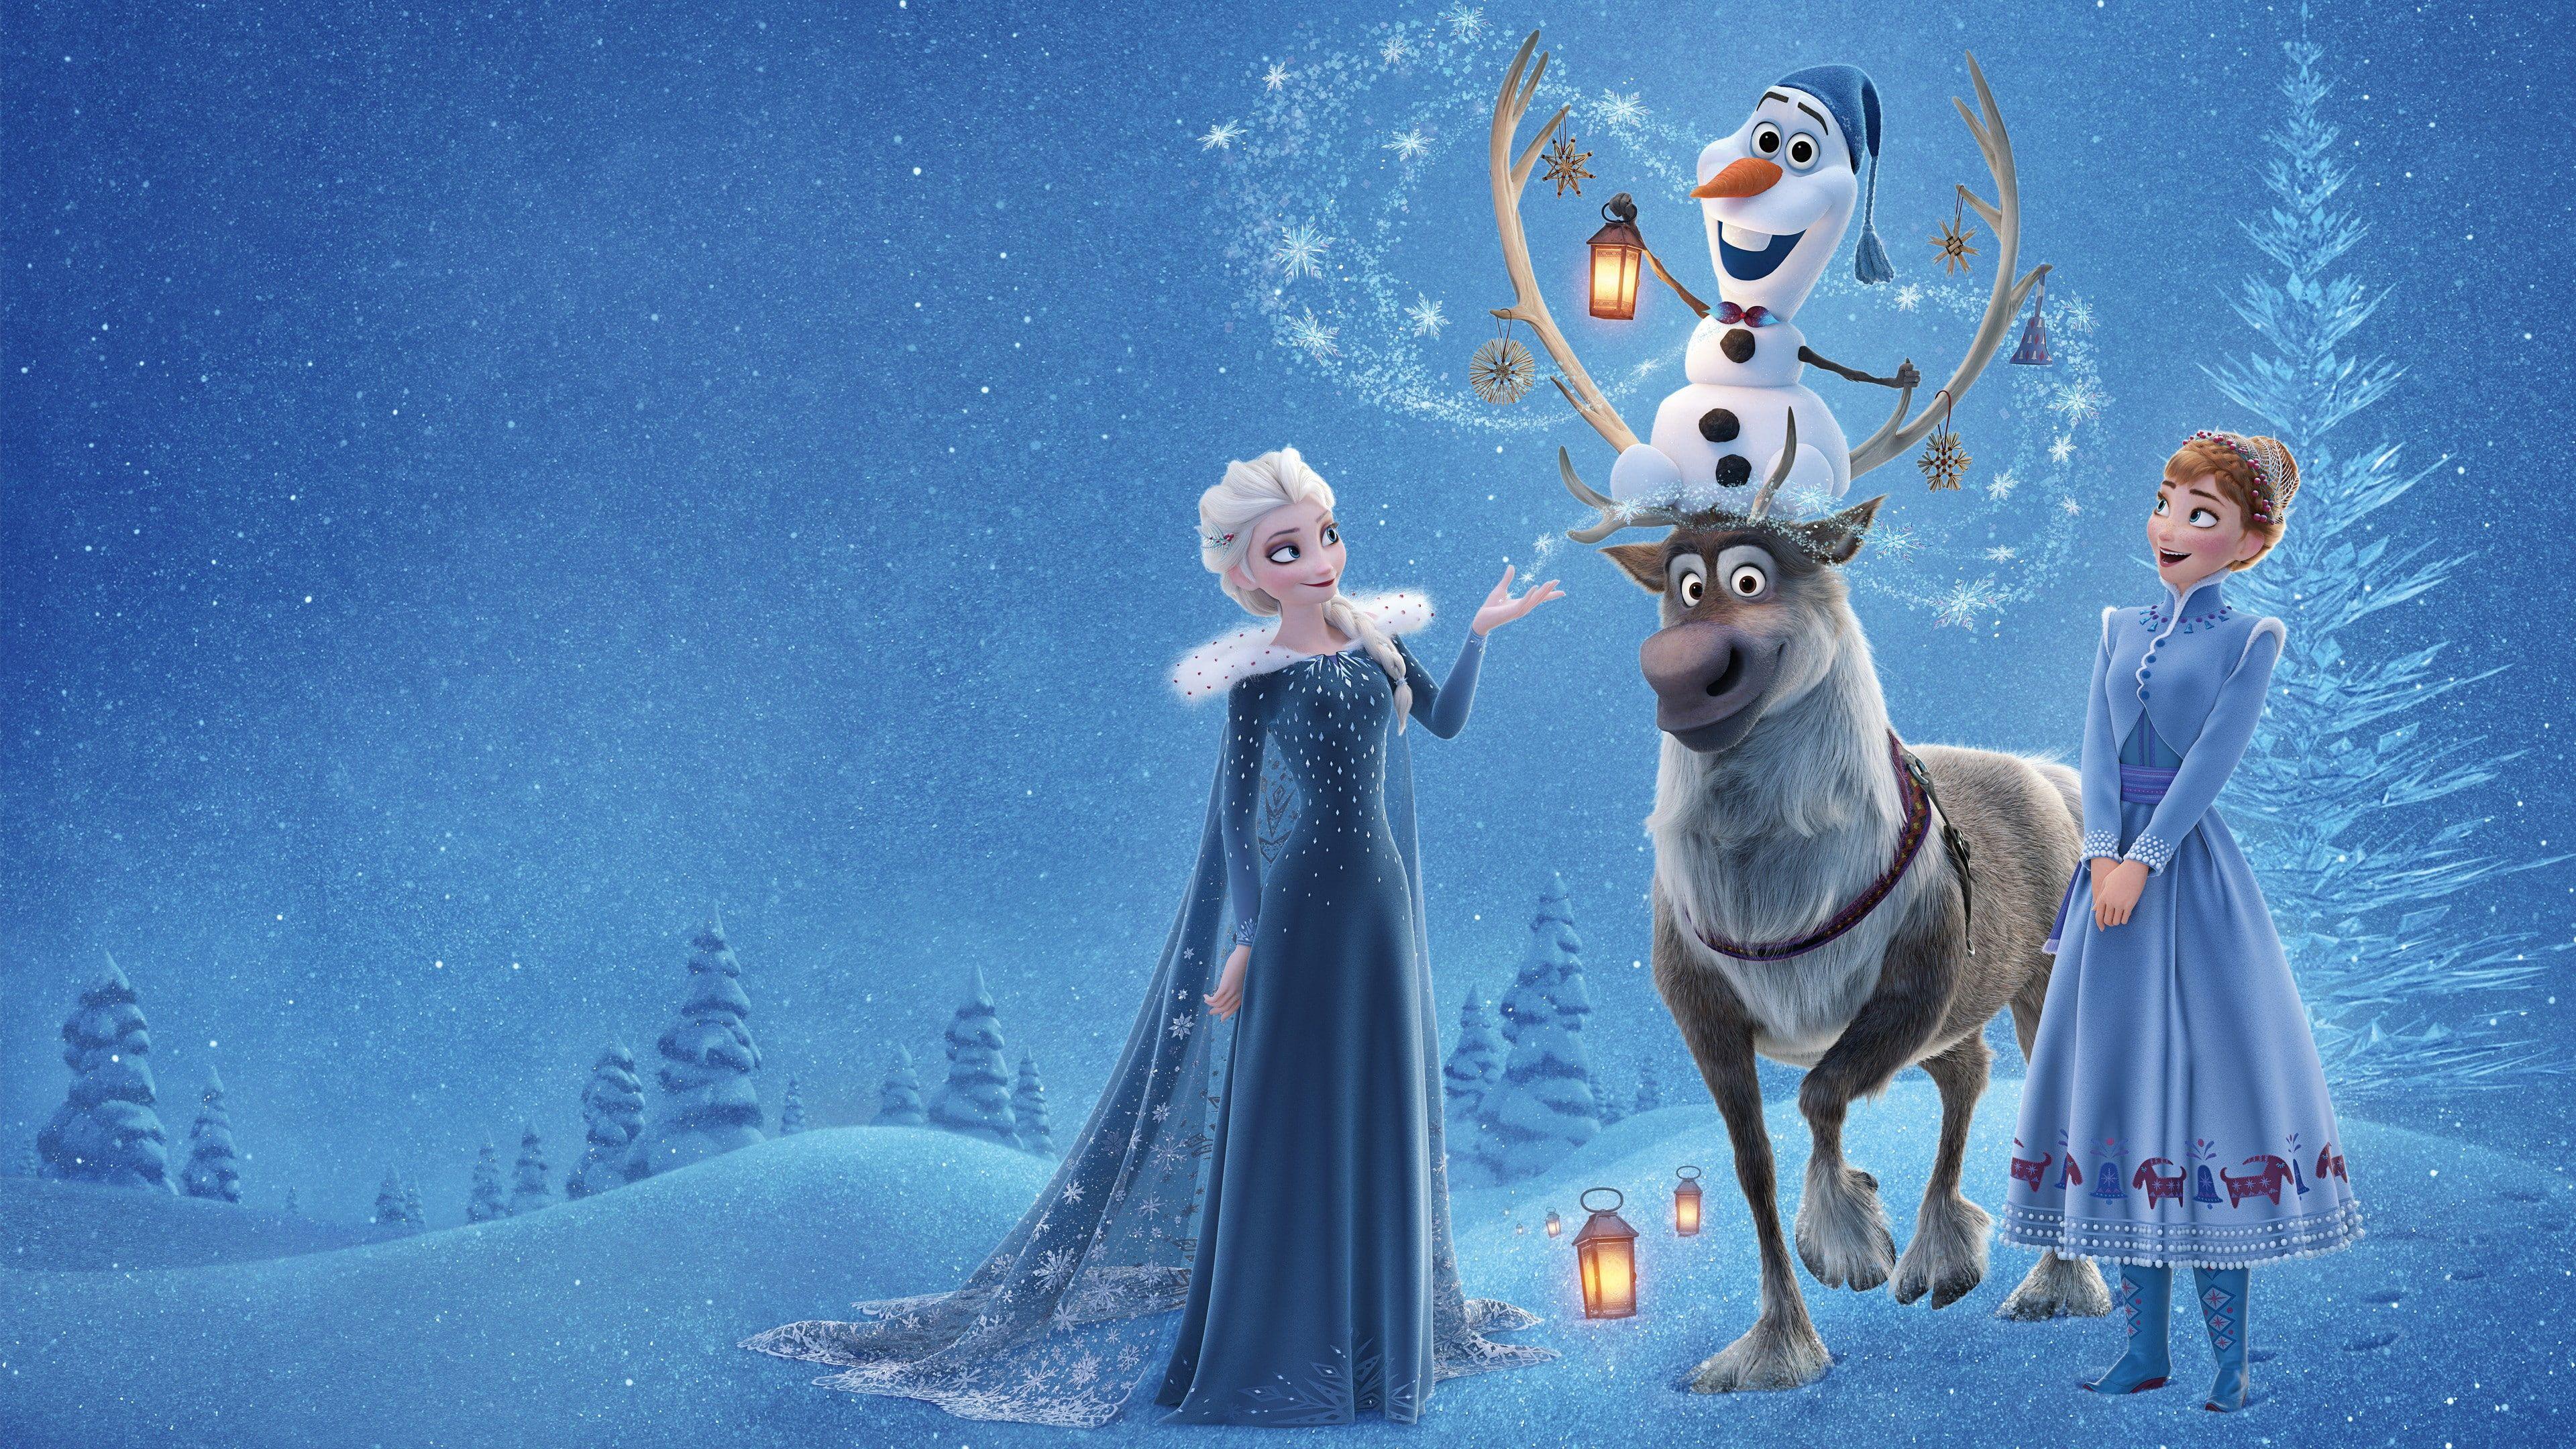 Disney Frozen Elsa Anna And Olaf Graphics Olaf S Frozen Adventure Elsa Anna Winter Deer Snow 4k 4k Wallpaper Hdwallpaper Desktop